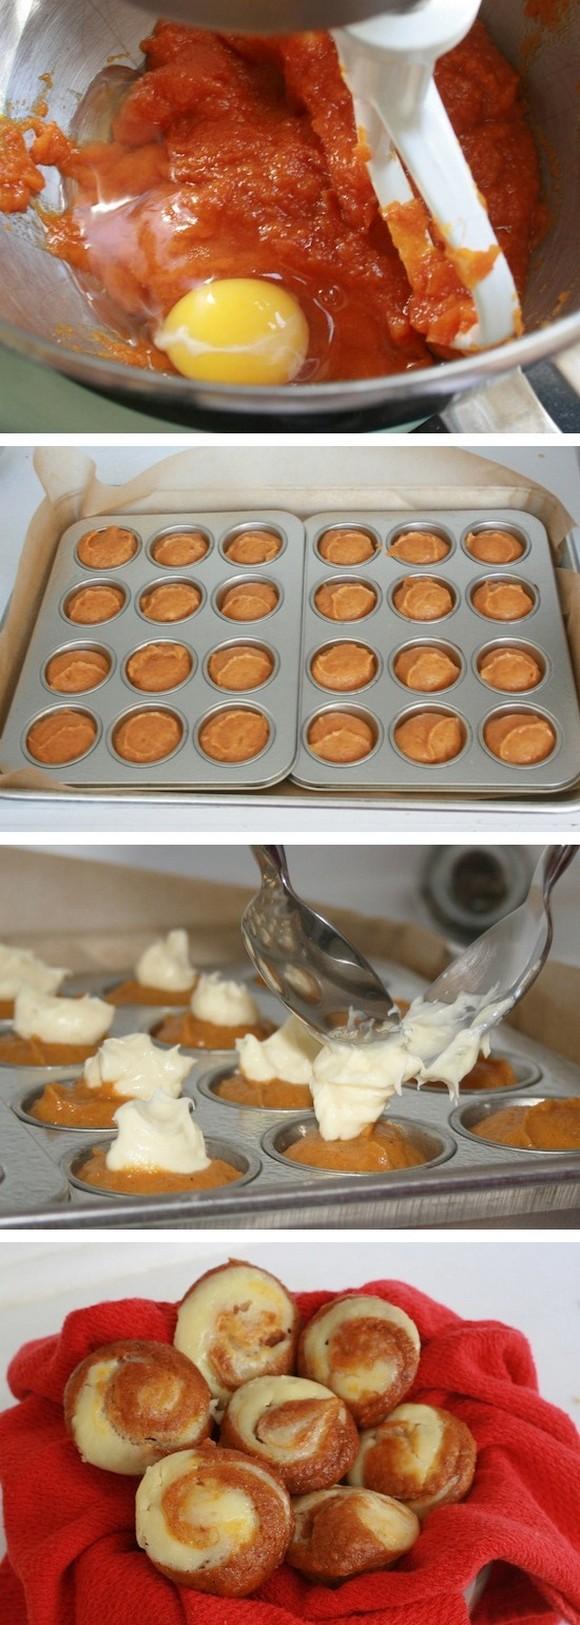 Easy Pumpkin Cheesecake Muffins recipe photo